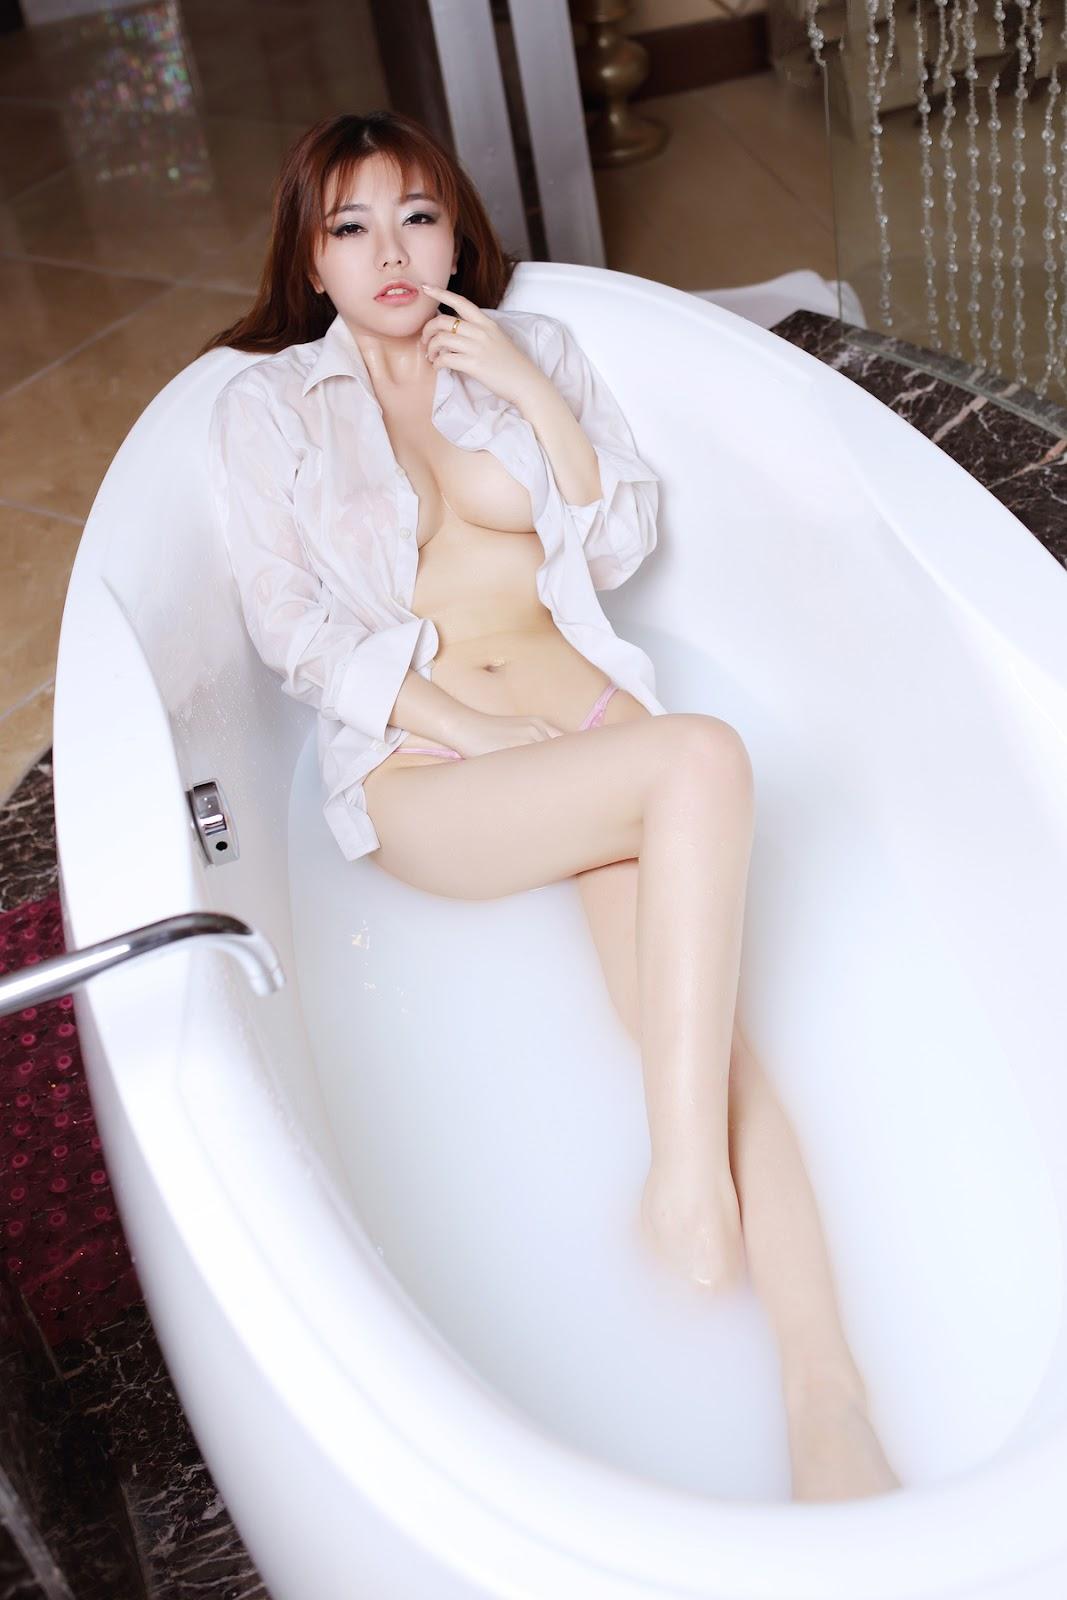 %2529%252B%252B%25C2%25A6%25C2%25B7 20 - TGOD Sexy Nude FAYE